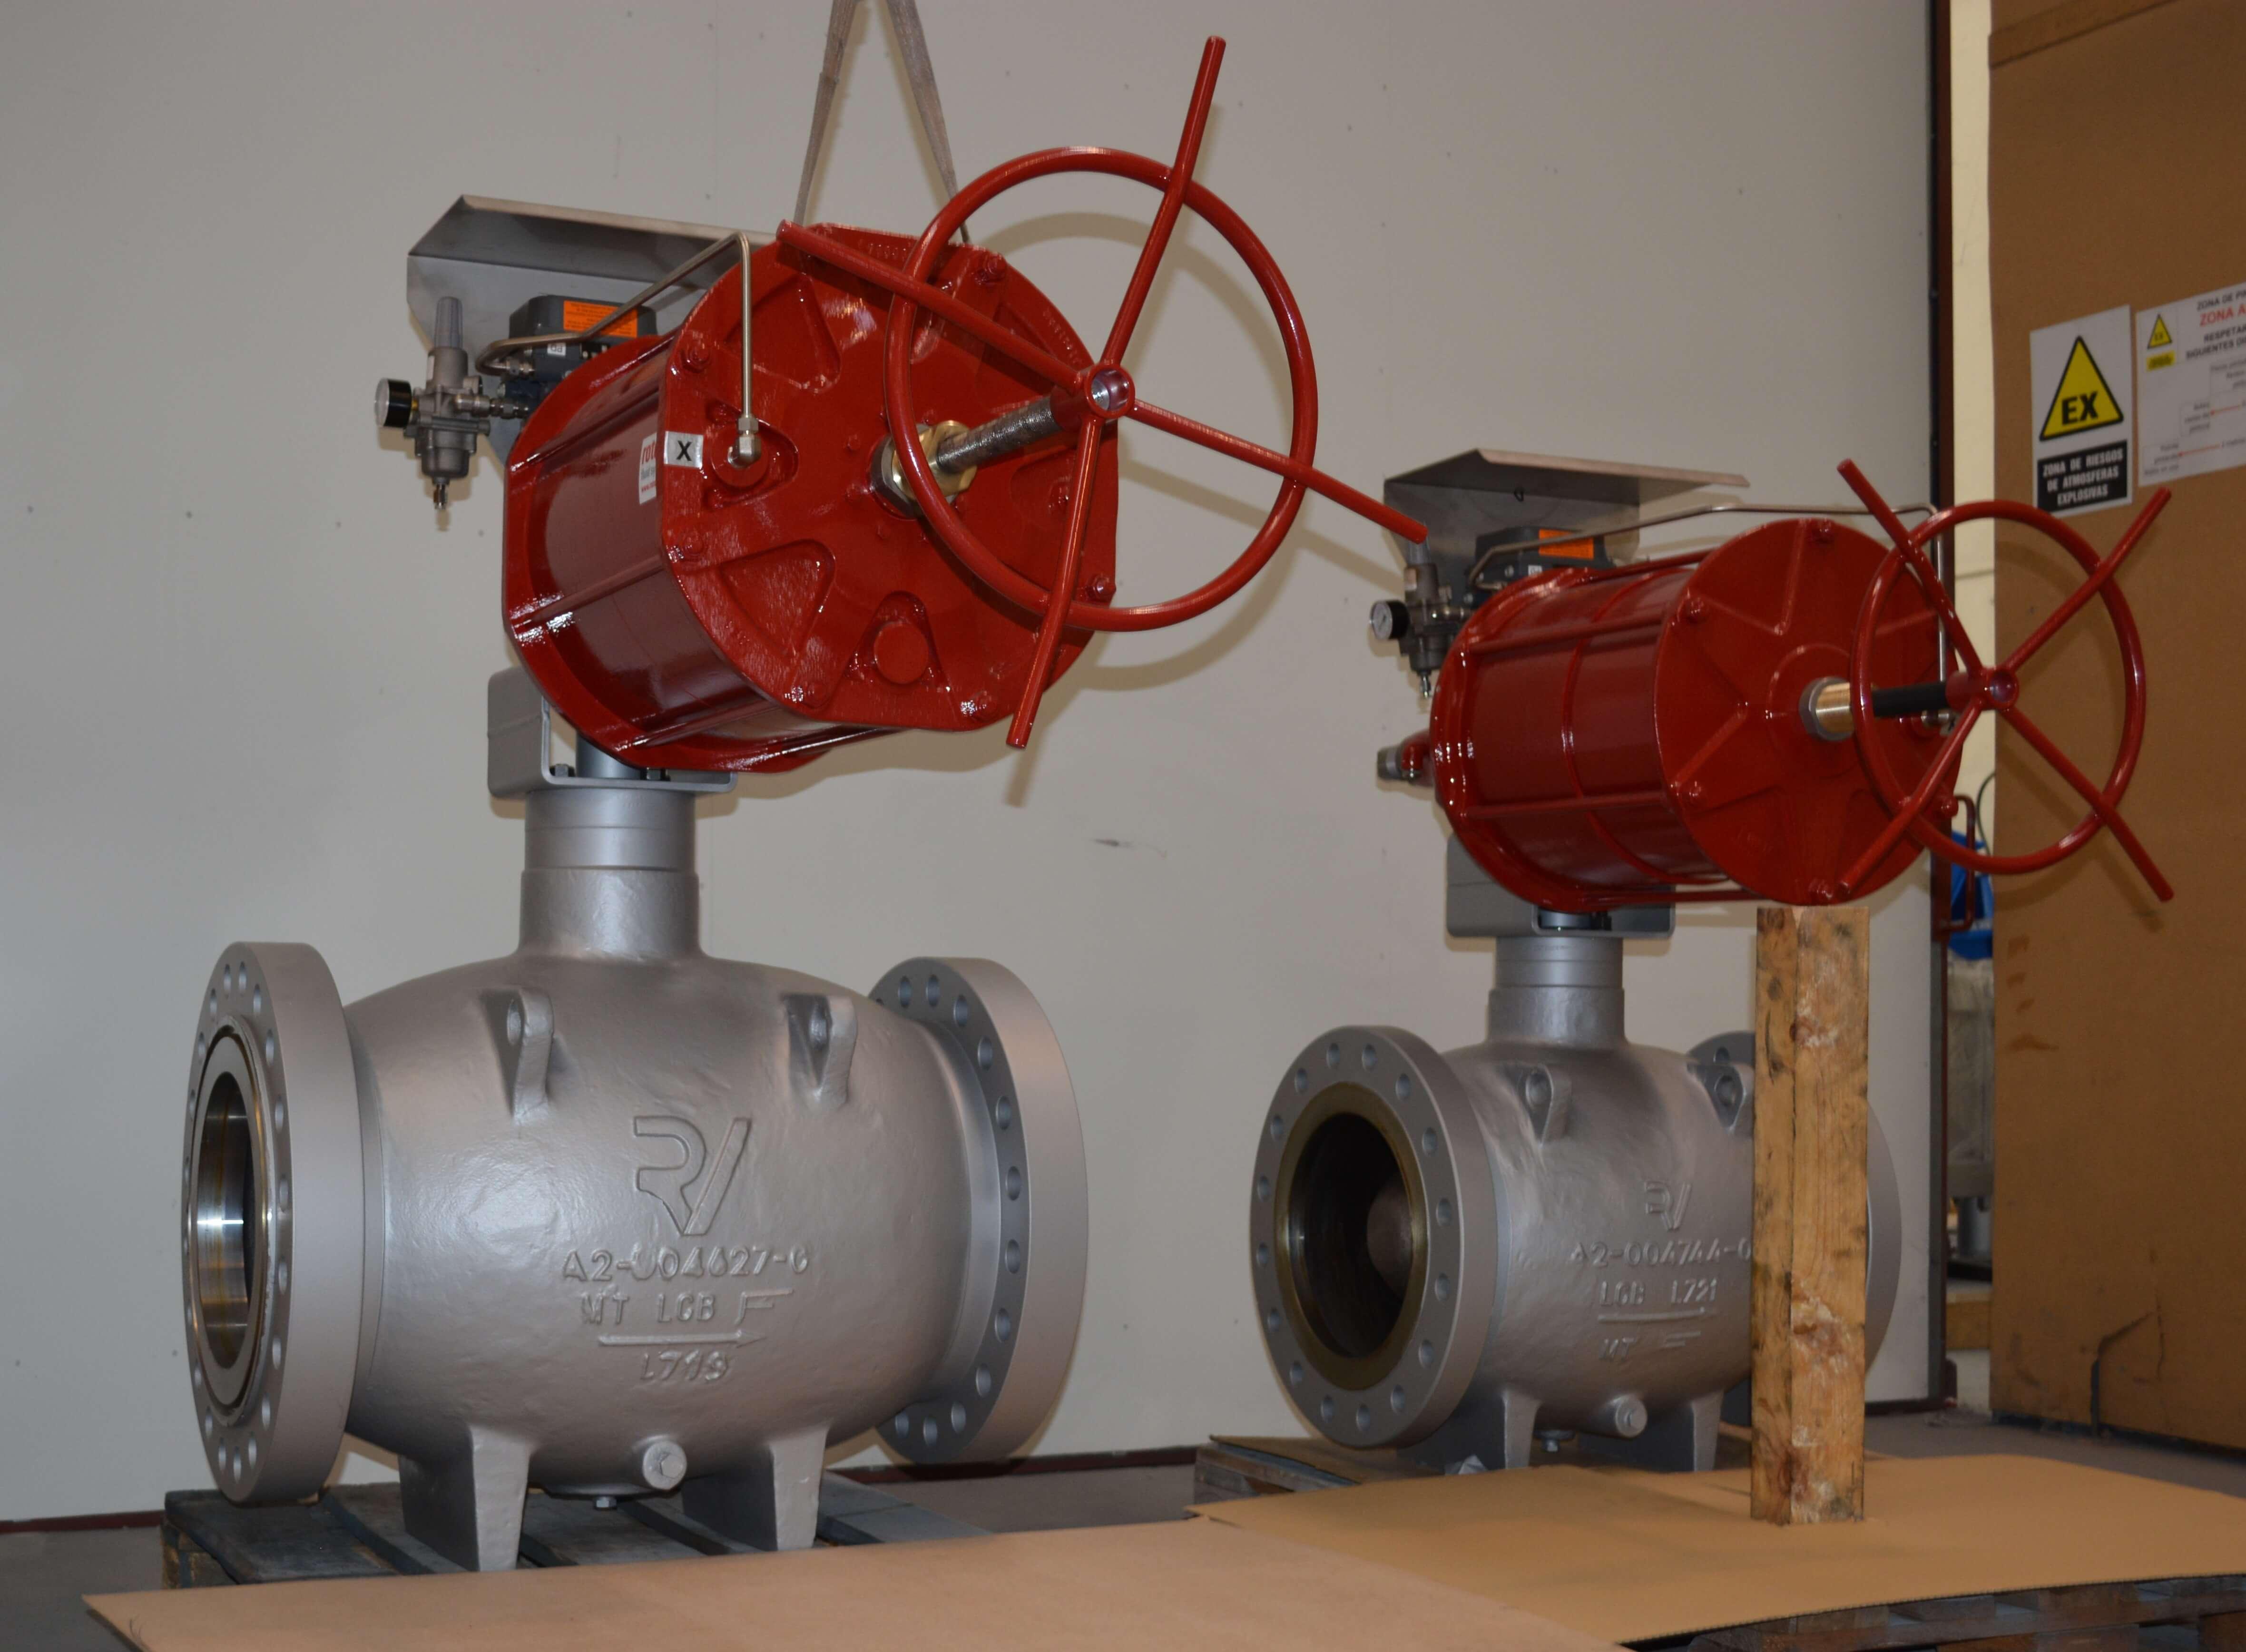 Axial Flow Valves Class 300 : News ringo valves